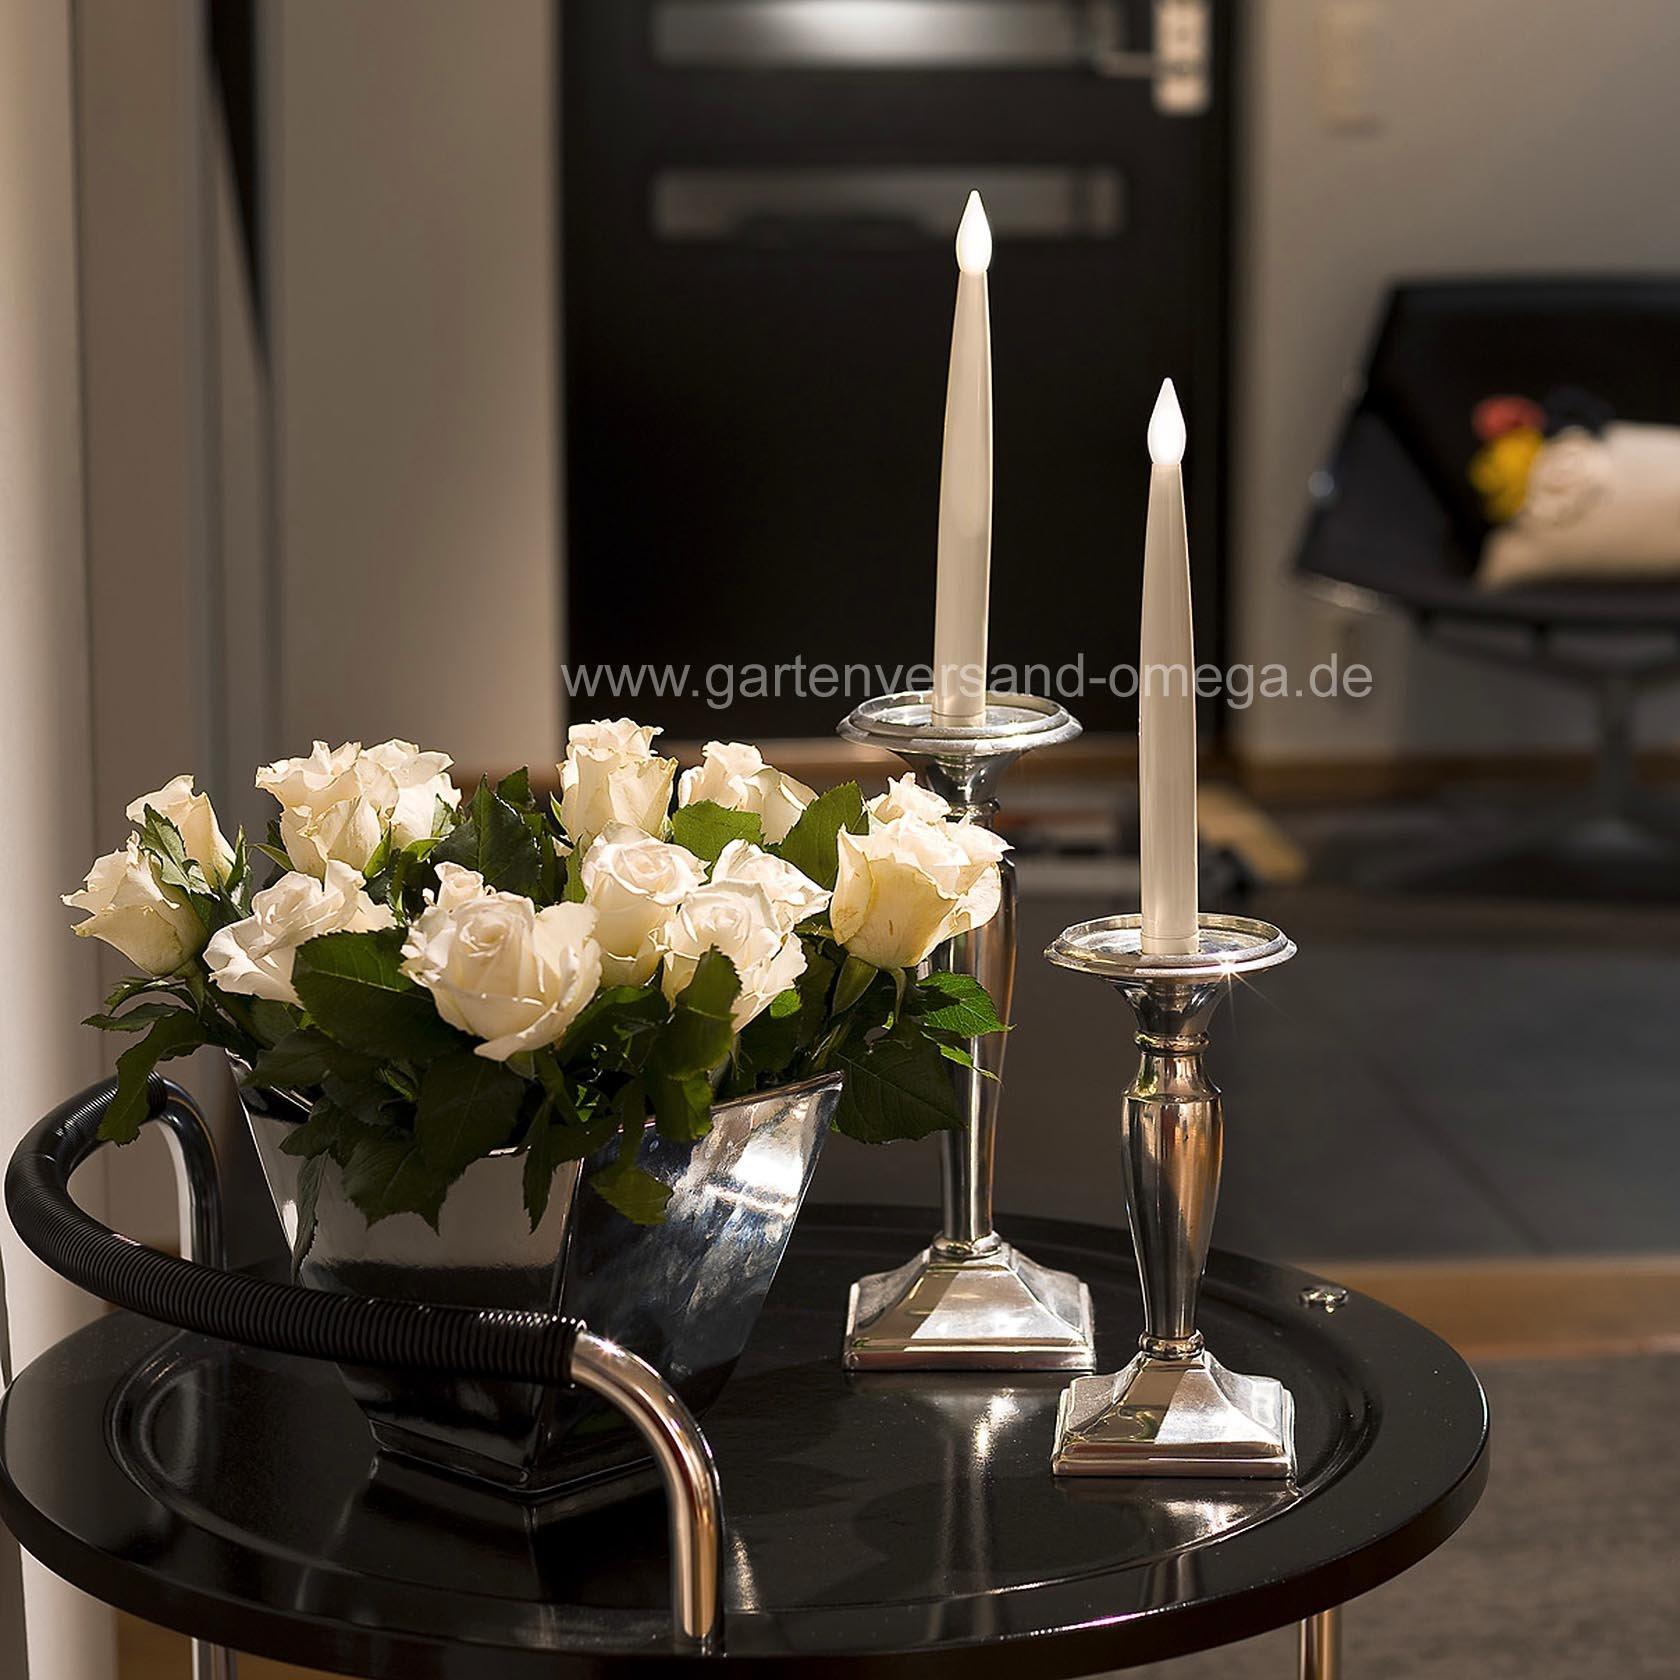 led kerzen led kerzen image gallery led kerze led kerzen mit beweglicher flamme youtube led. Black Bedroom Furniture Sets. Home Design Ideas